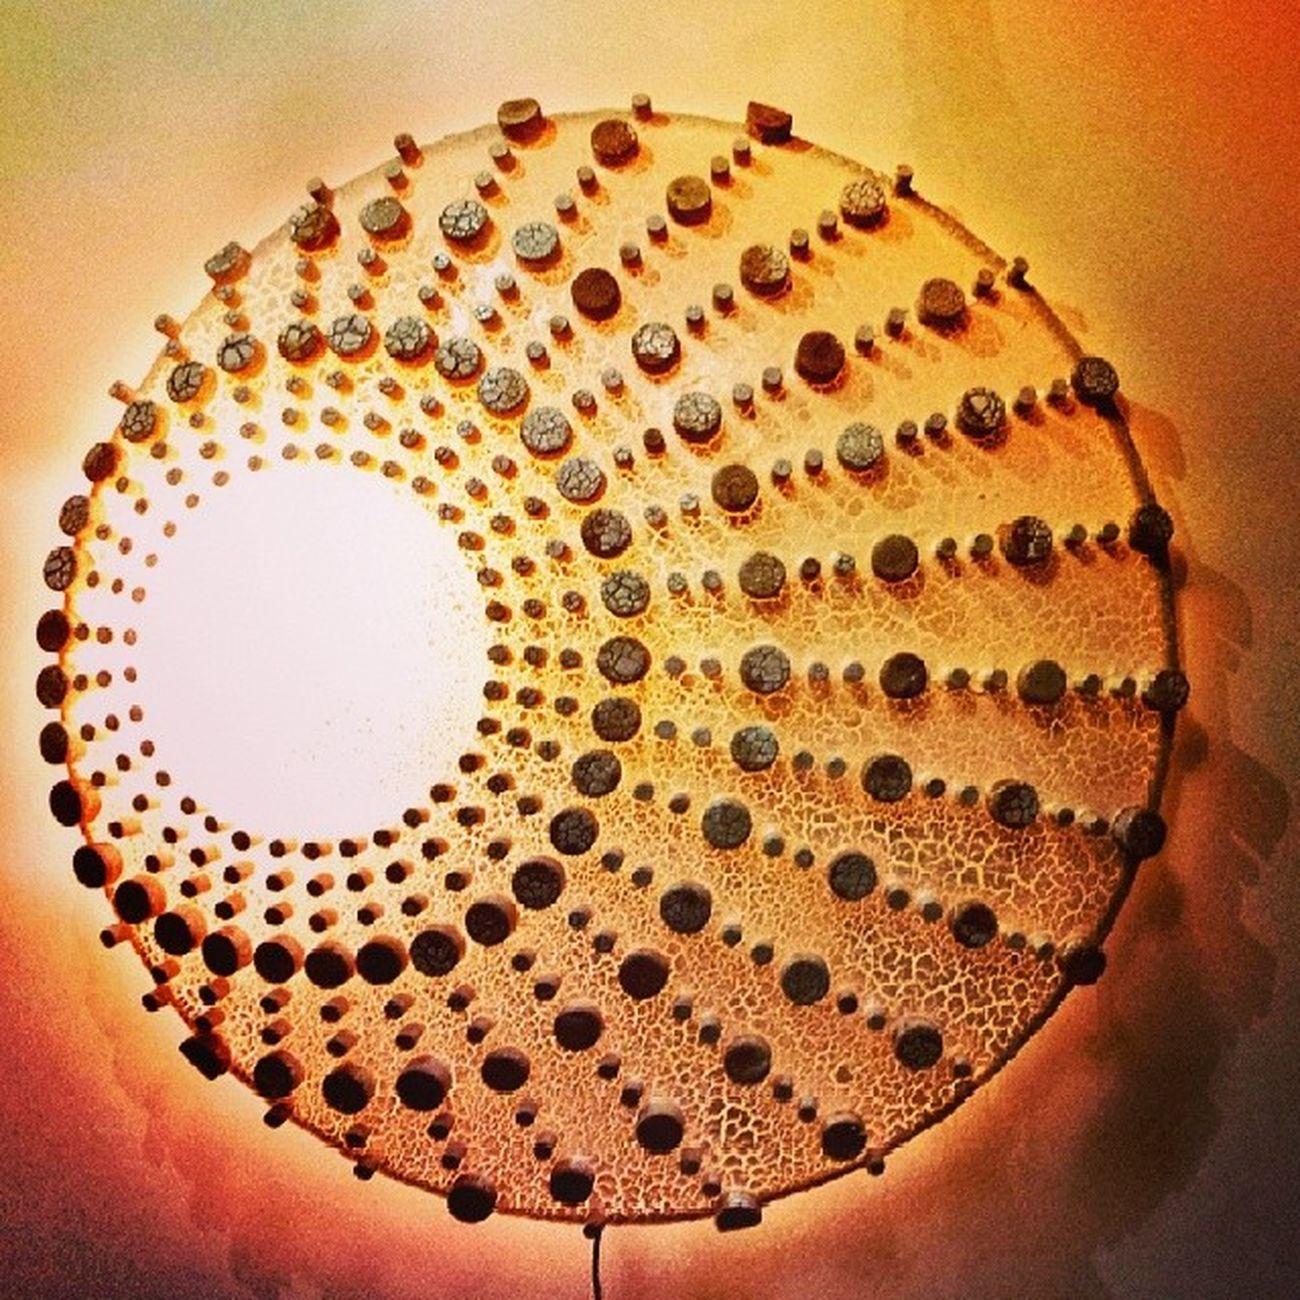 A nice lighting fixture here in New Era Inn (Mabolo, Cebu).... Light Lighting Fixture Shell itsmorefuninthephilippines pinoy wanderlust filipinoart filipinoculture filipino pinoyartistry cebu travelphilippines discovercebu samsung samsungasia samsungphotography